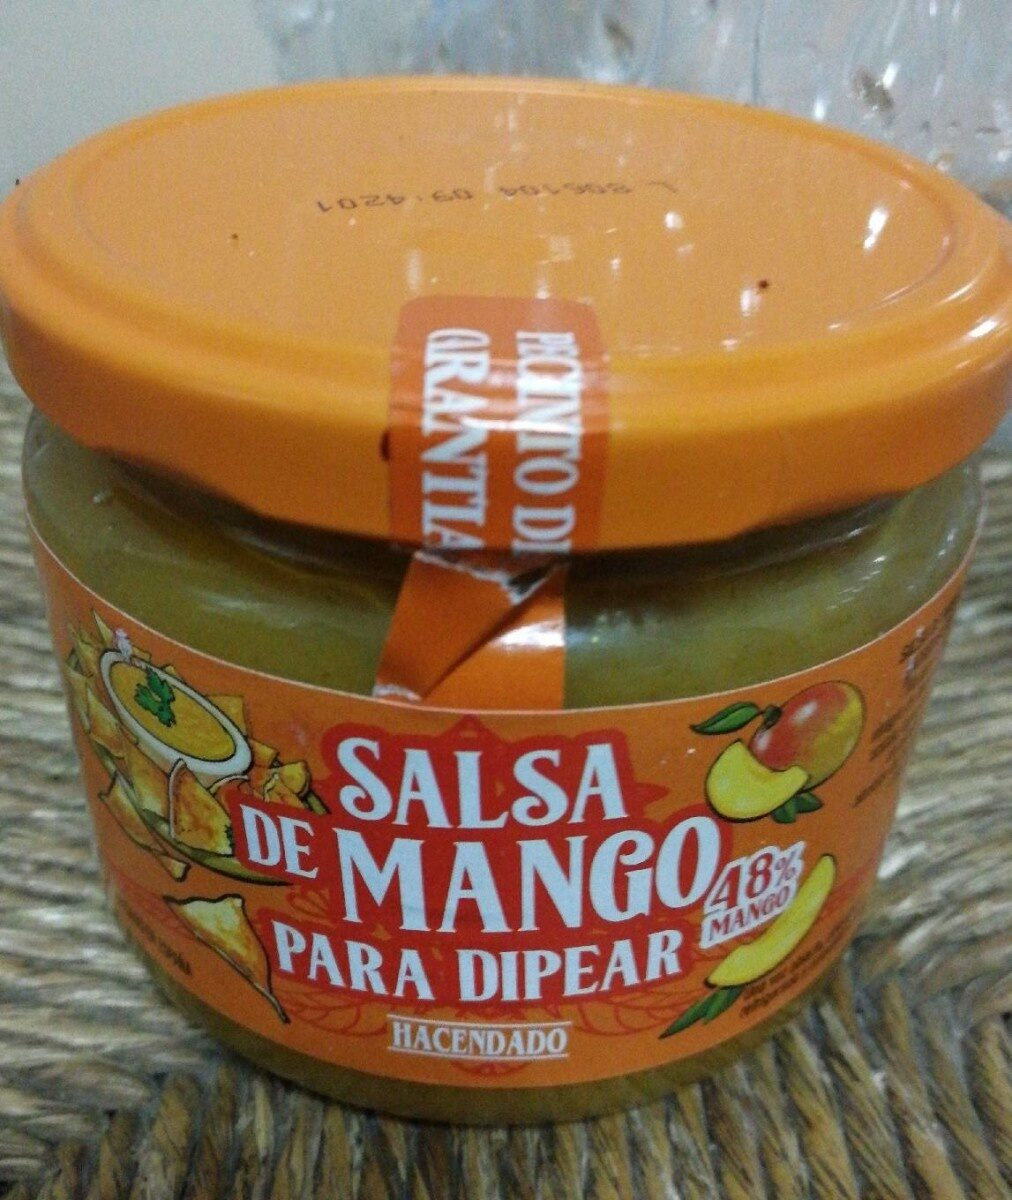 Salsa de mango para dipear - Producto